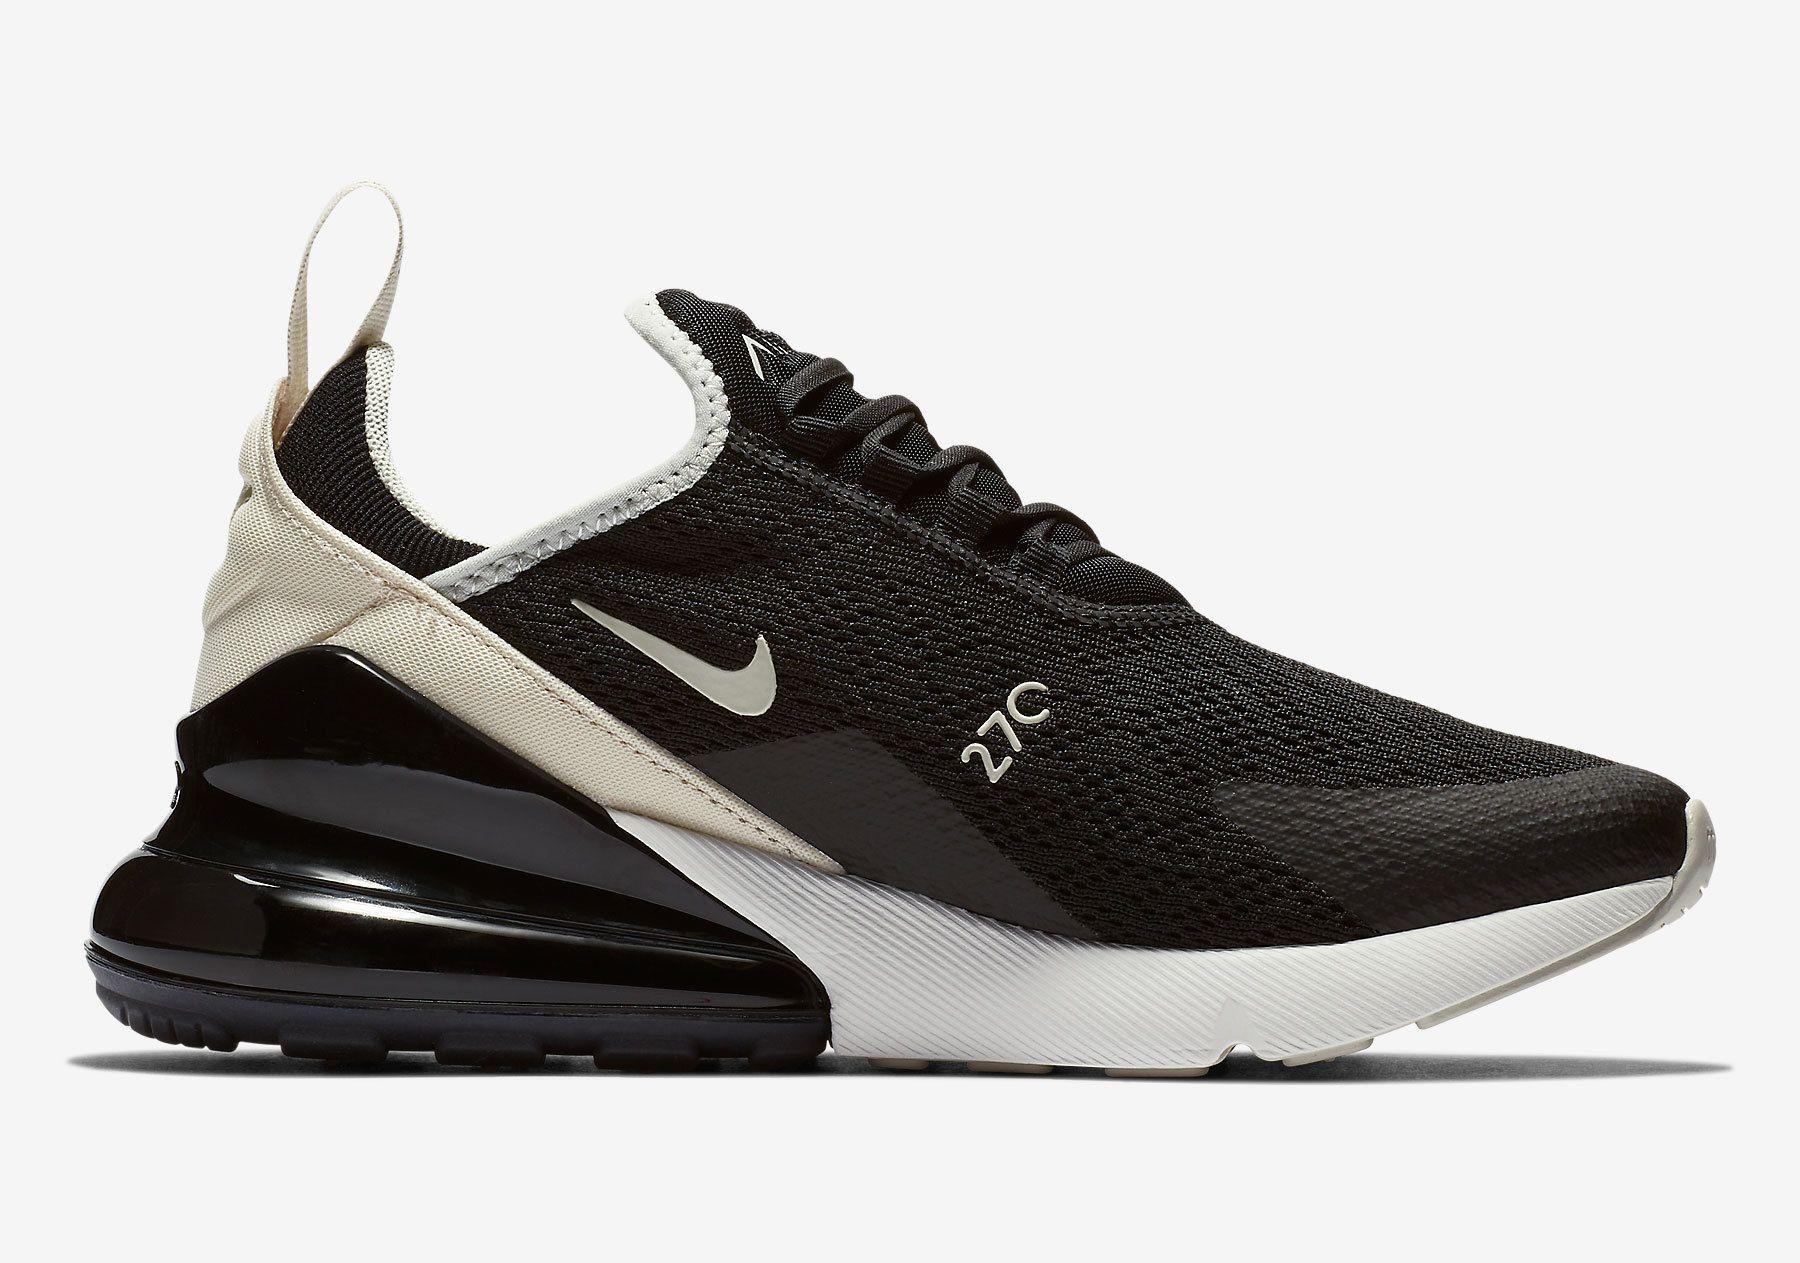 Nike Air Max 270 Ah6789 010 3